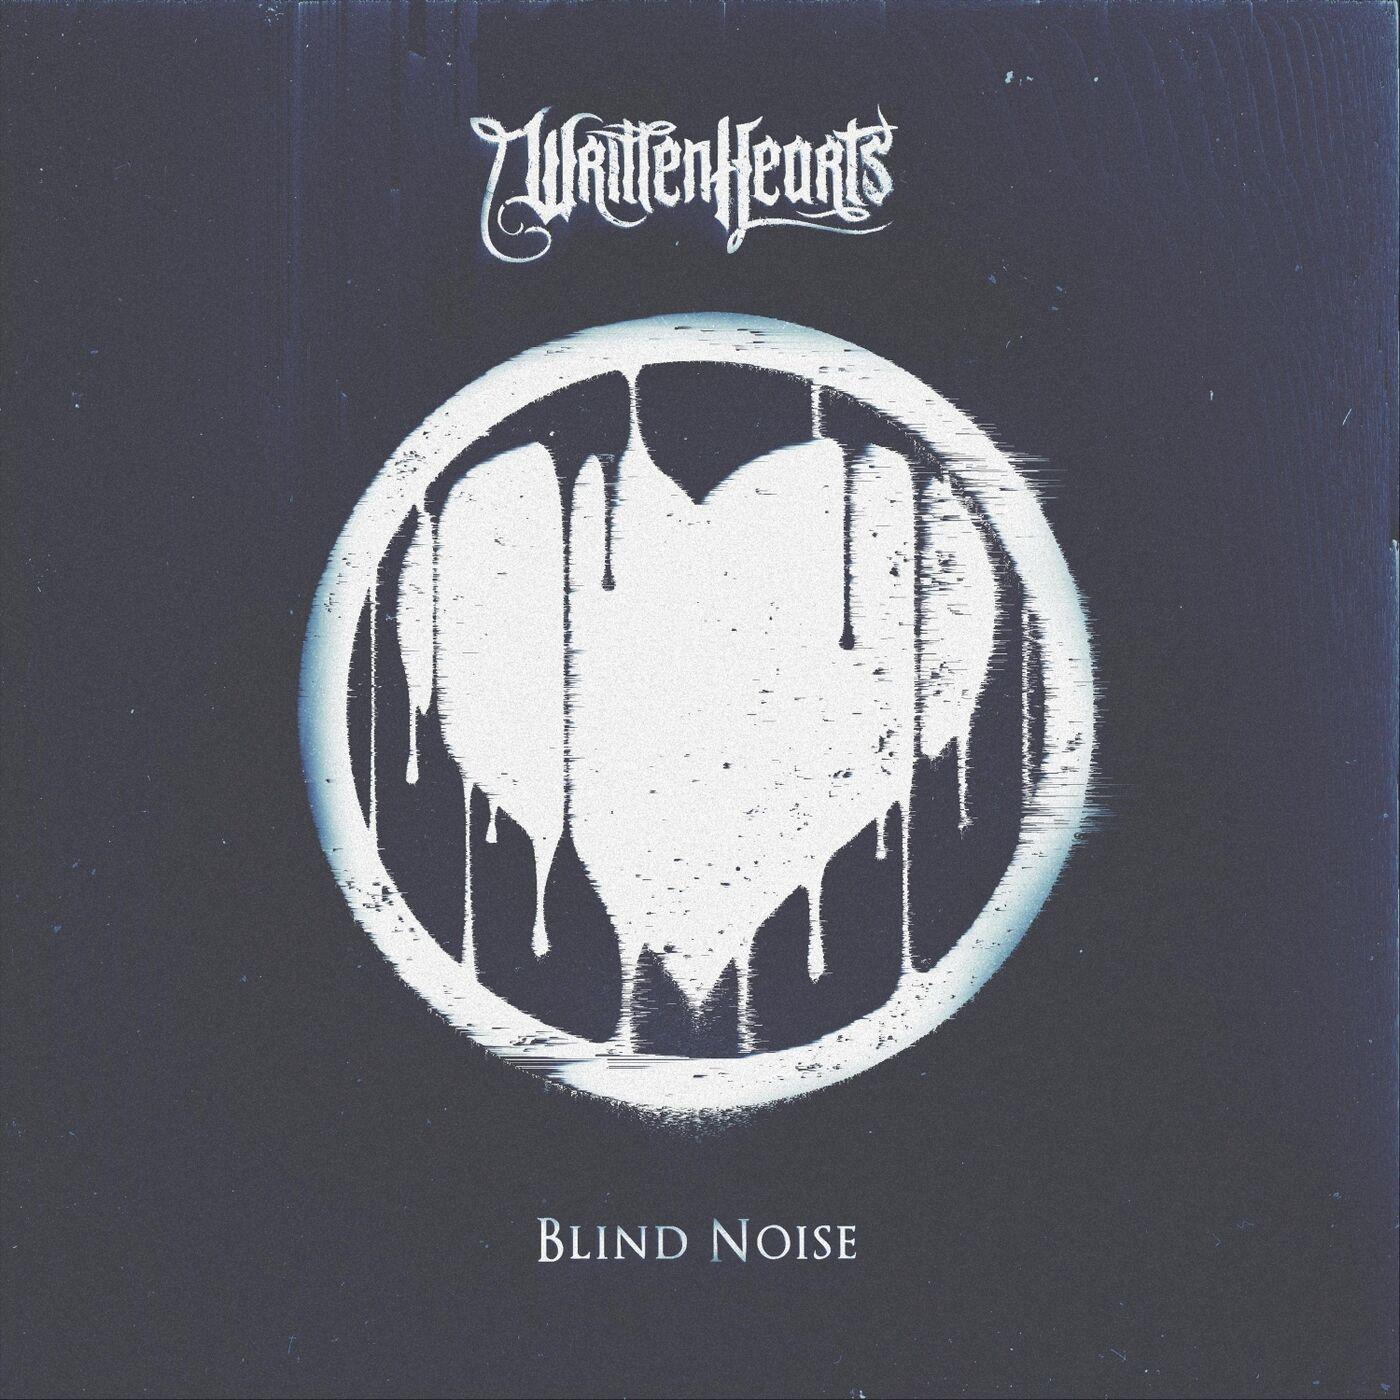 Written Hearts - Blind Noise [EP] (2019)